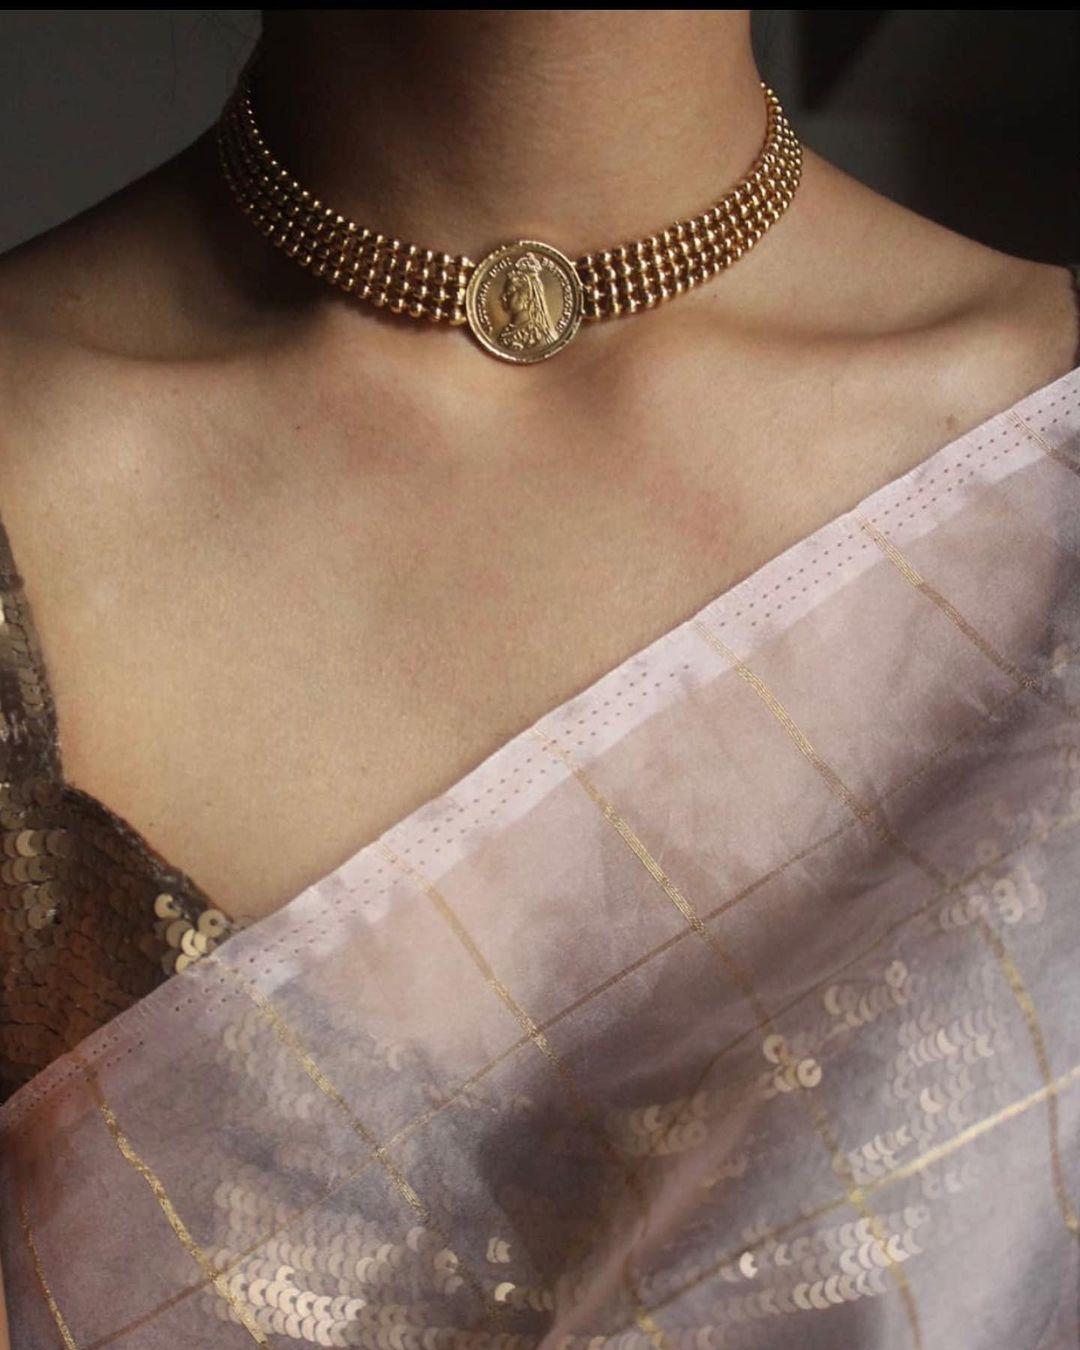 queen-pendant-choker-necklace